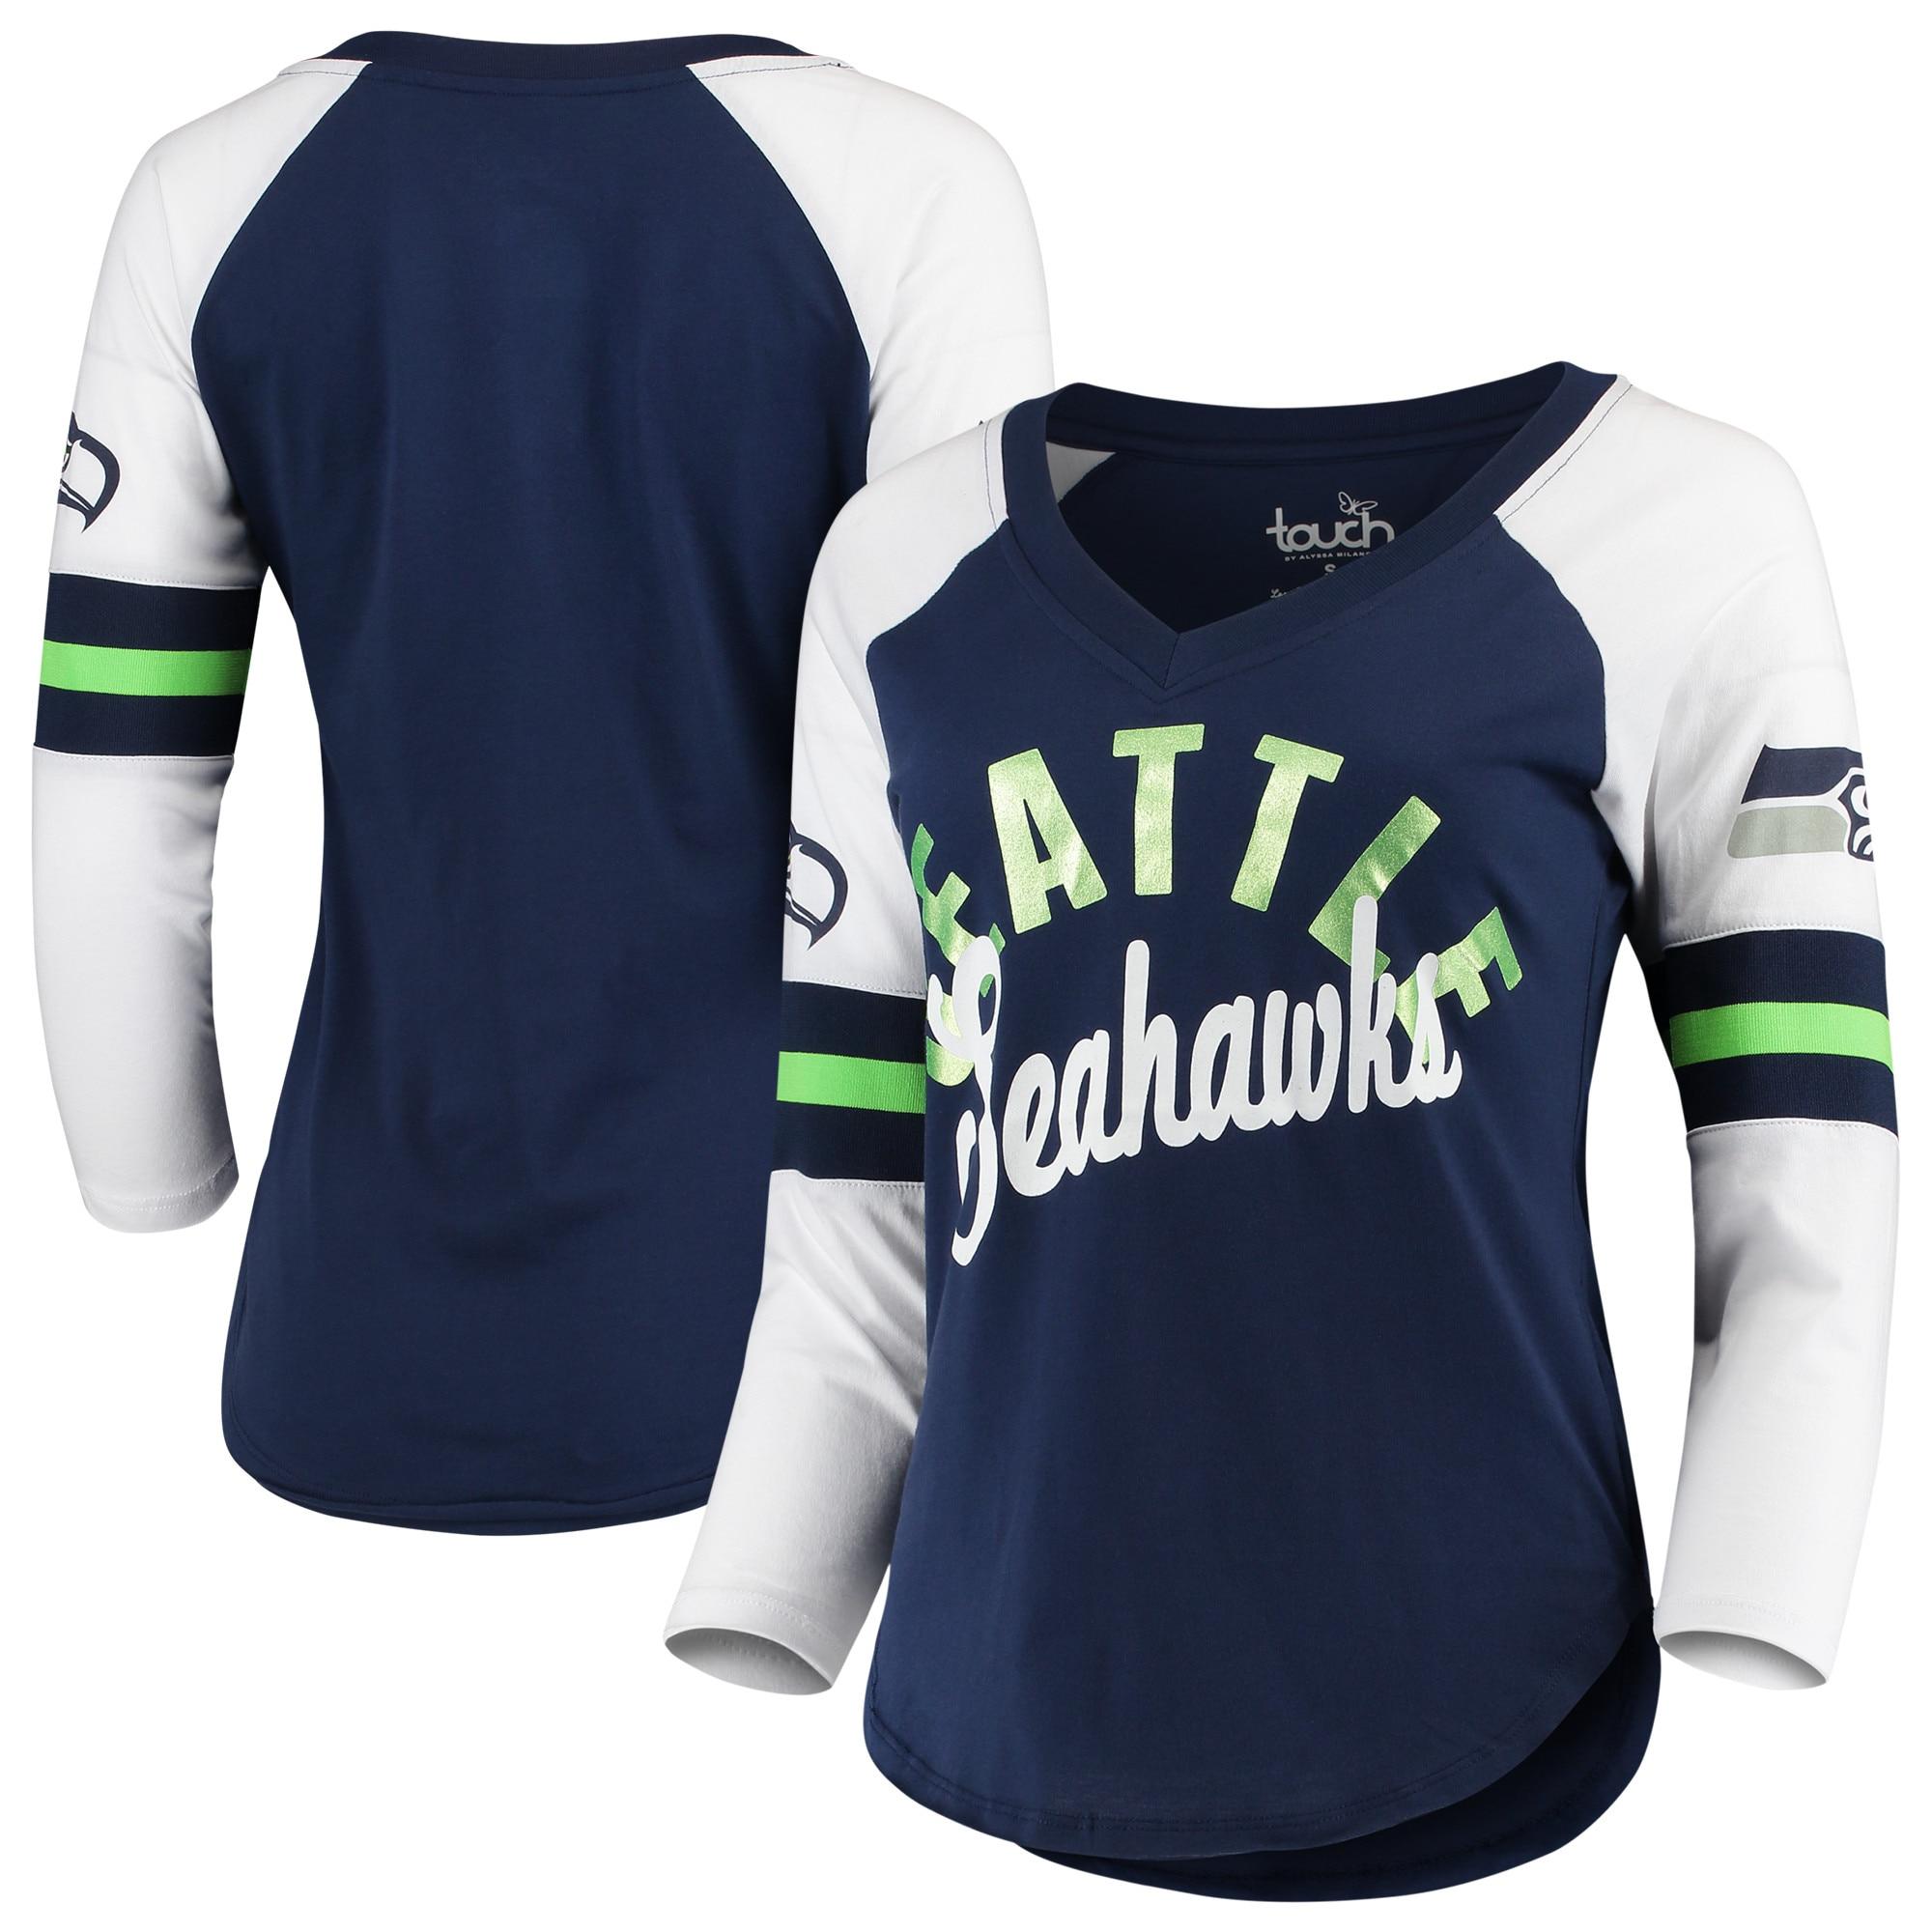 Seattle Seahawks Touch by Alyssa Milano Women's Reflex 3/4-Sleeve Raglan V-Neck T-Shirt - College Navy/White